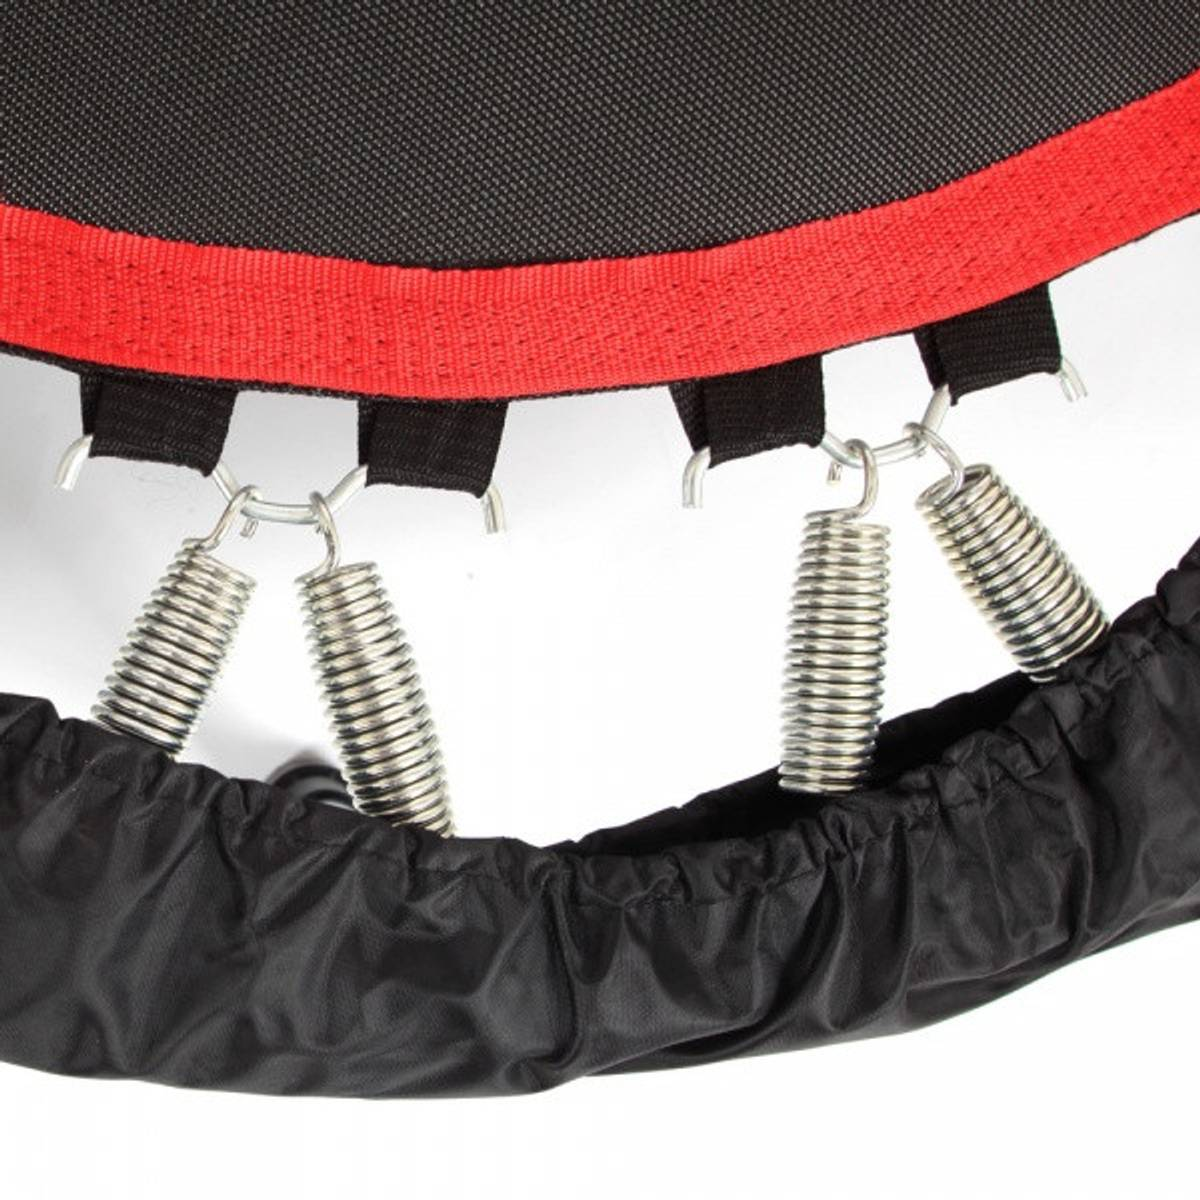 inSPORTline Fitness trampoline PROFI Digital 140 cm